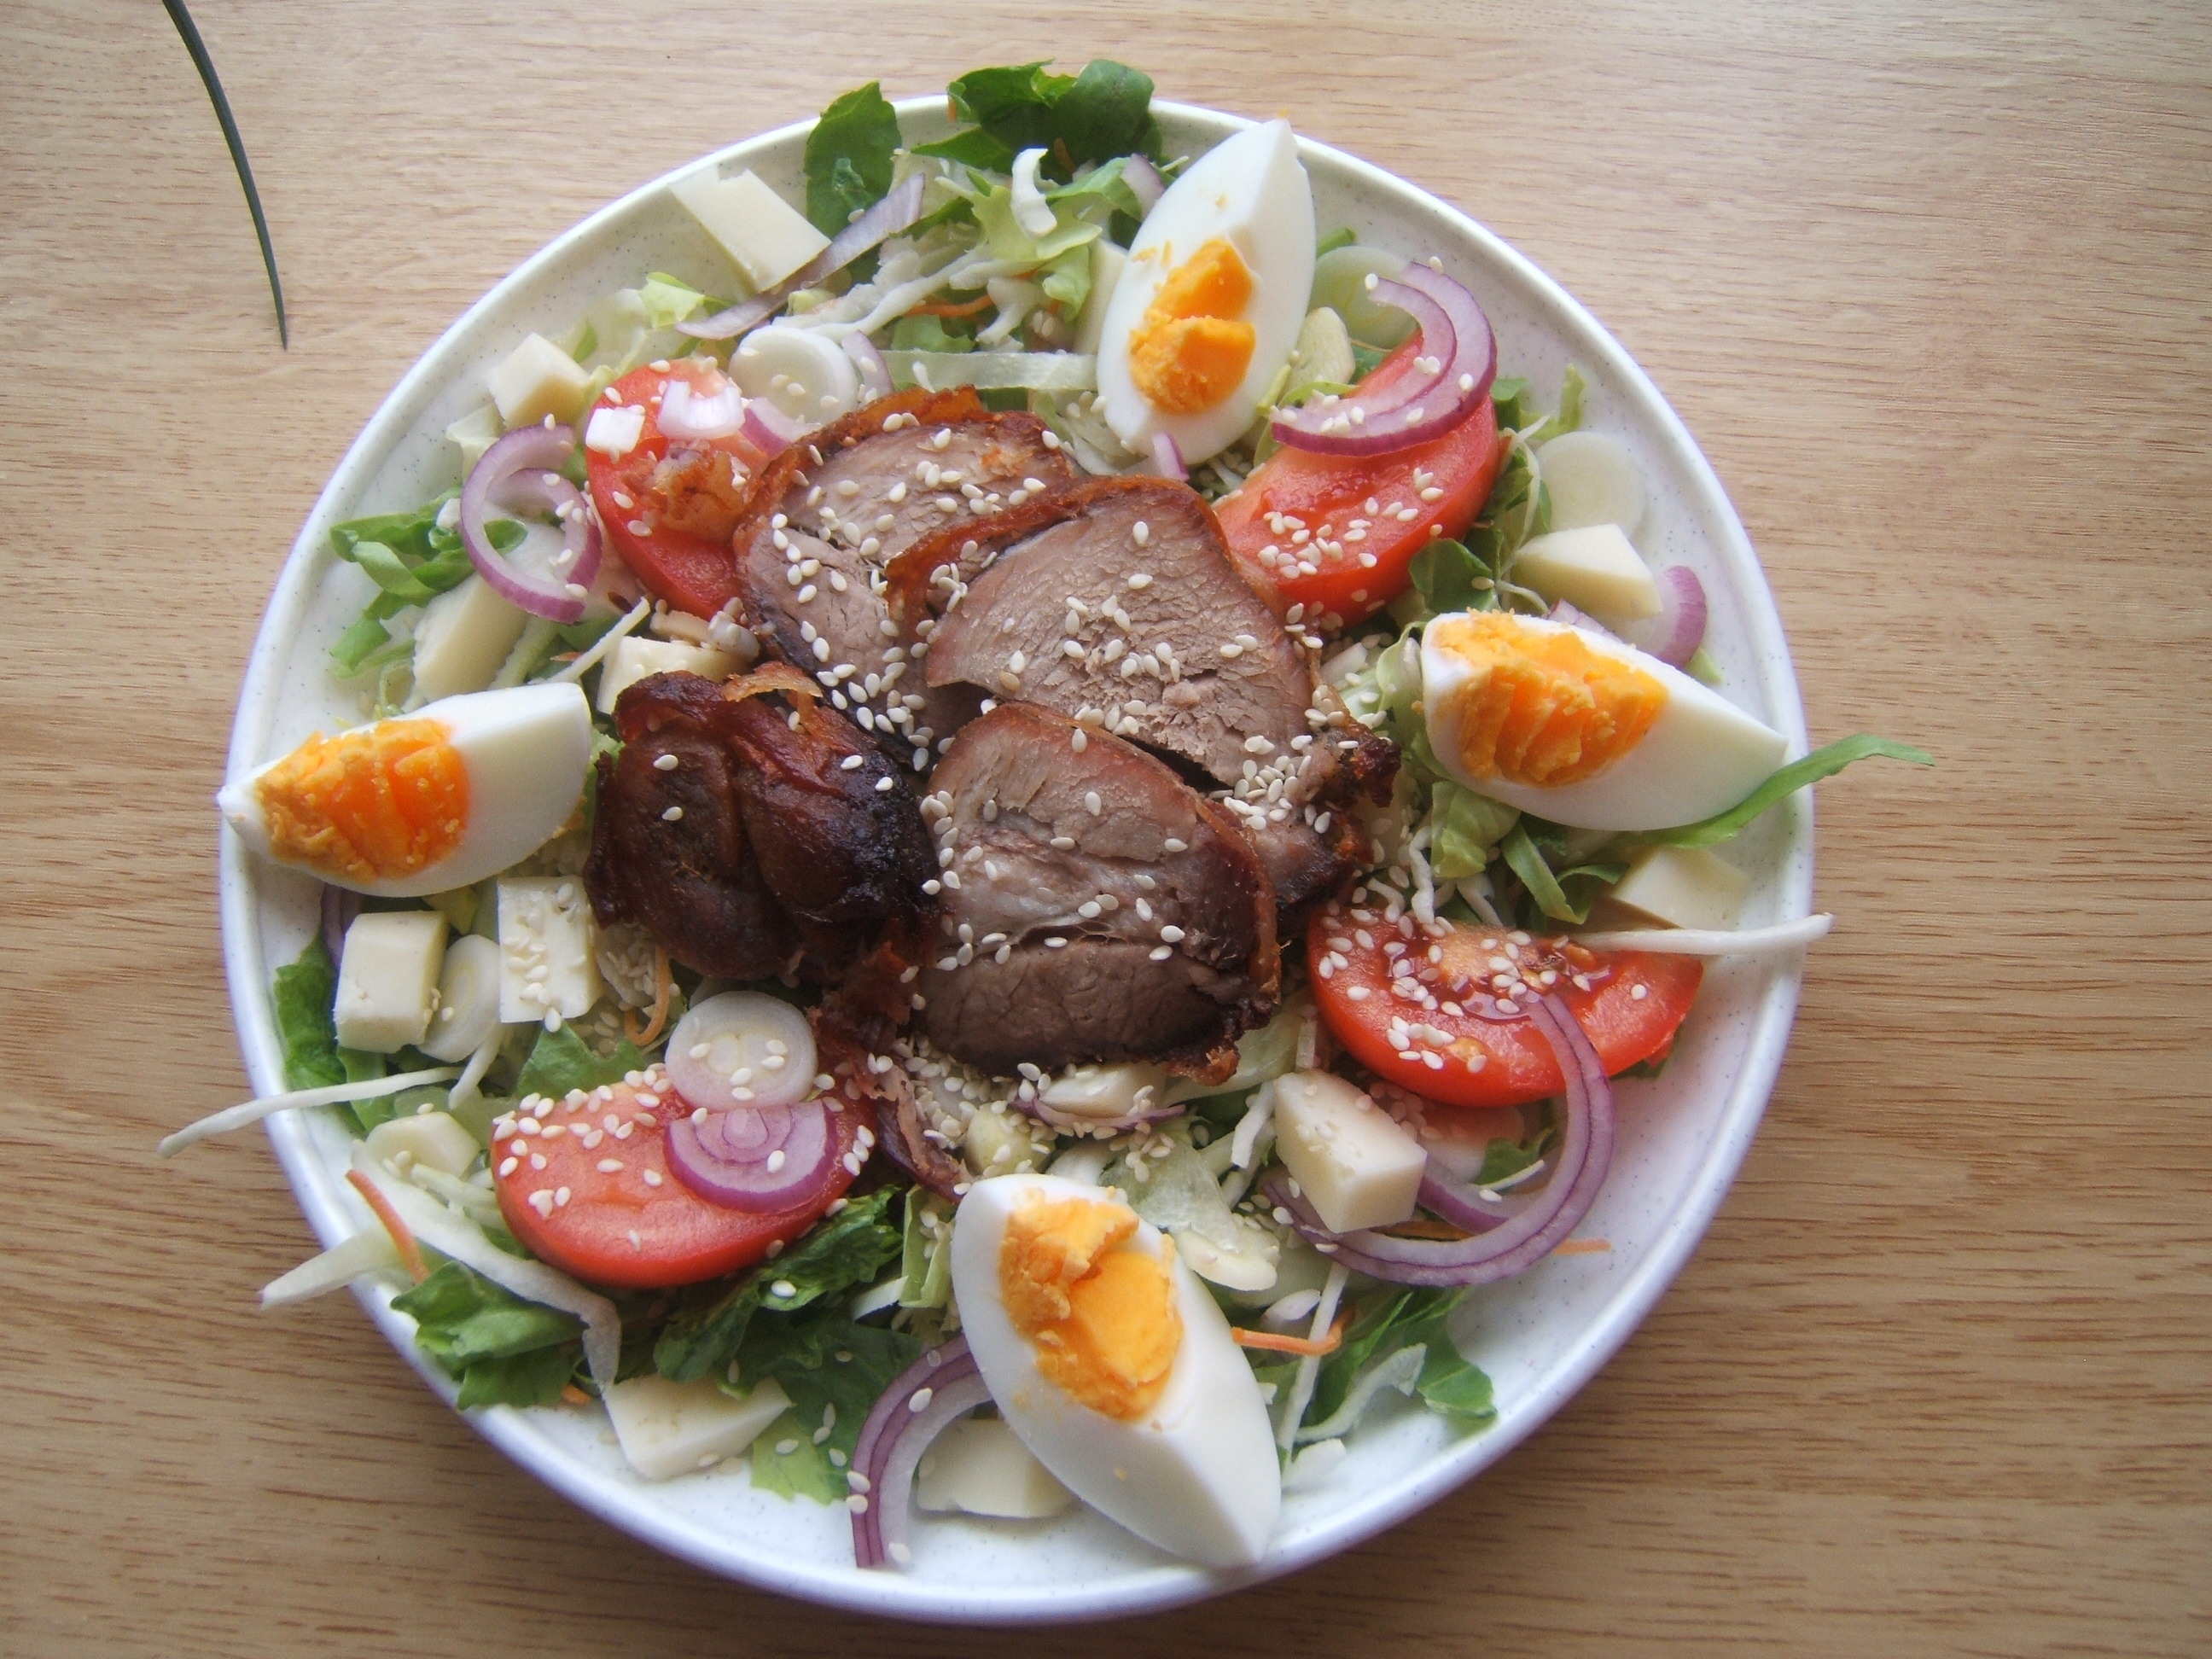 baconbe_tekert_kacsamell_salataval_glutenmentes_5.JPG